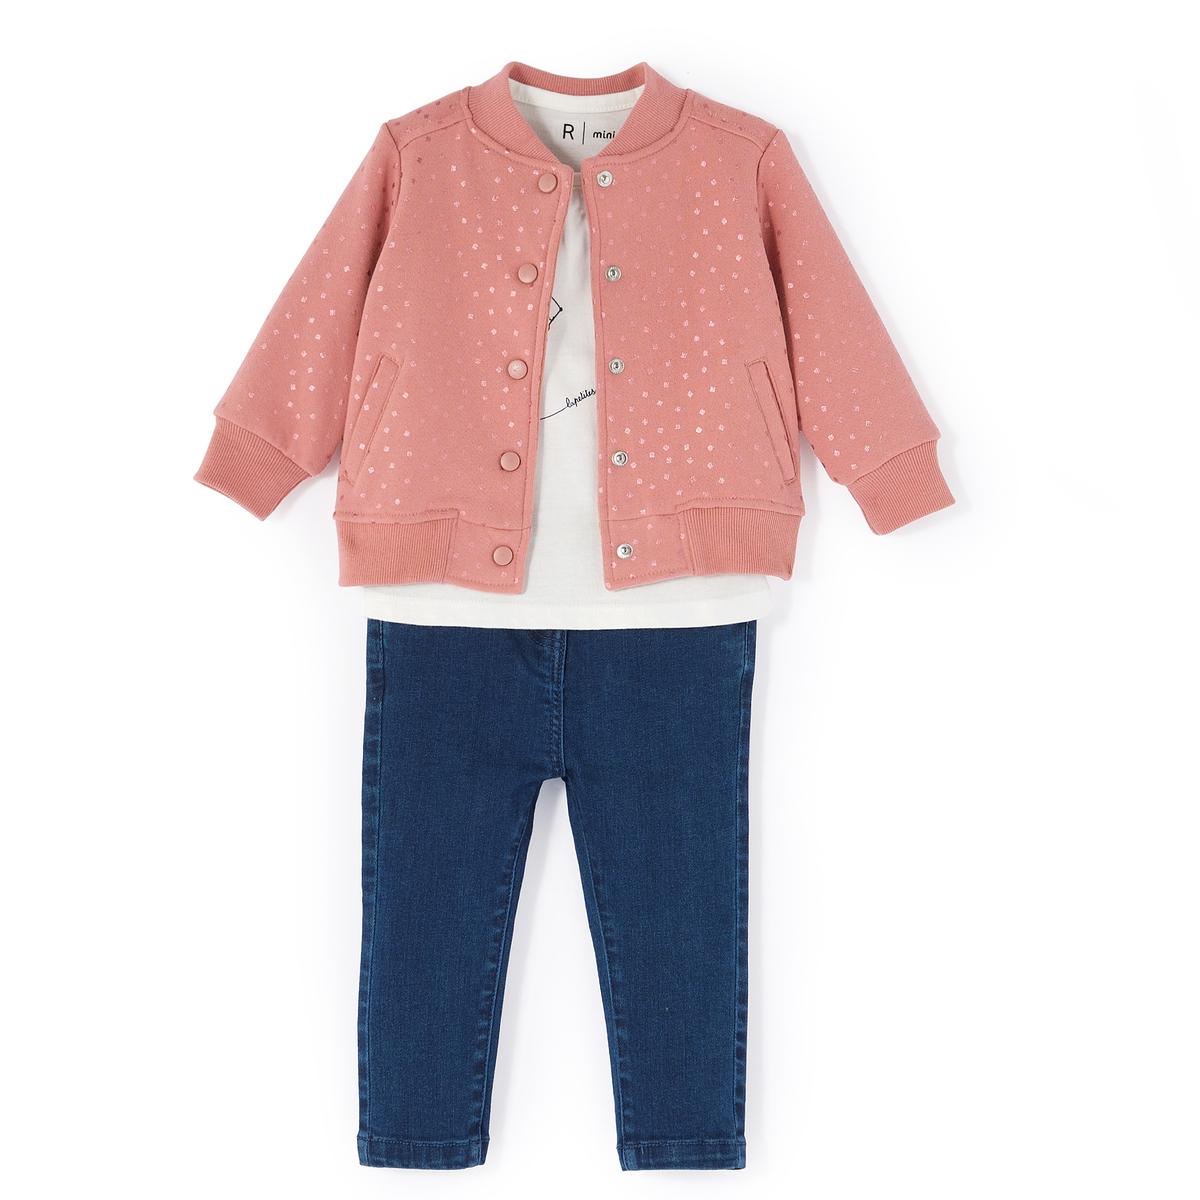 Комплект для младенца из куртки ,футболки и брюк 1 мес.-3 года от La Redoute Collections